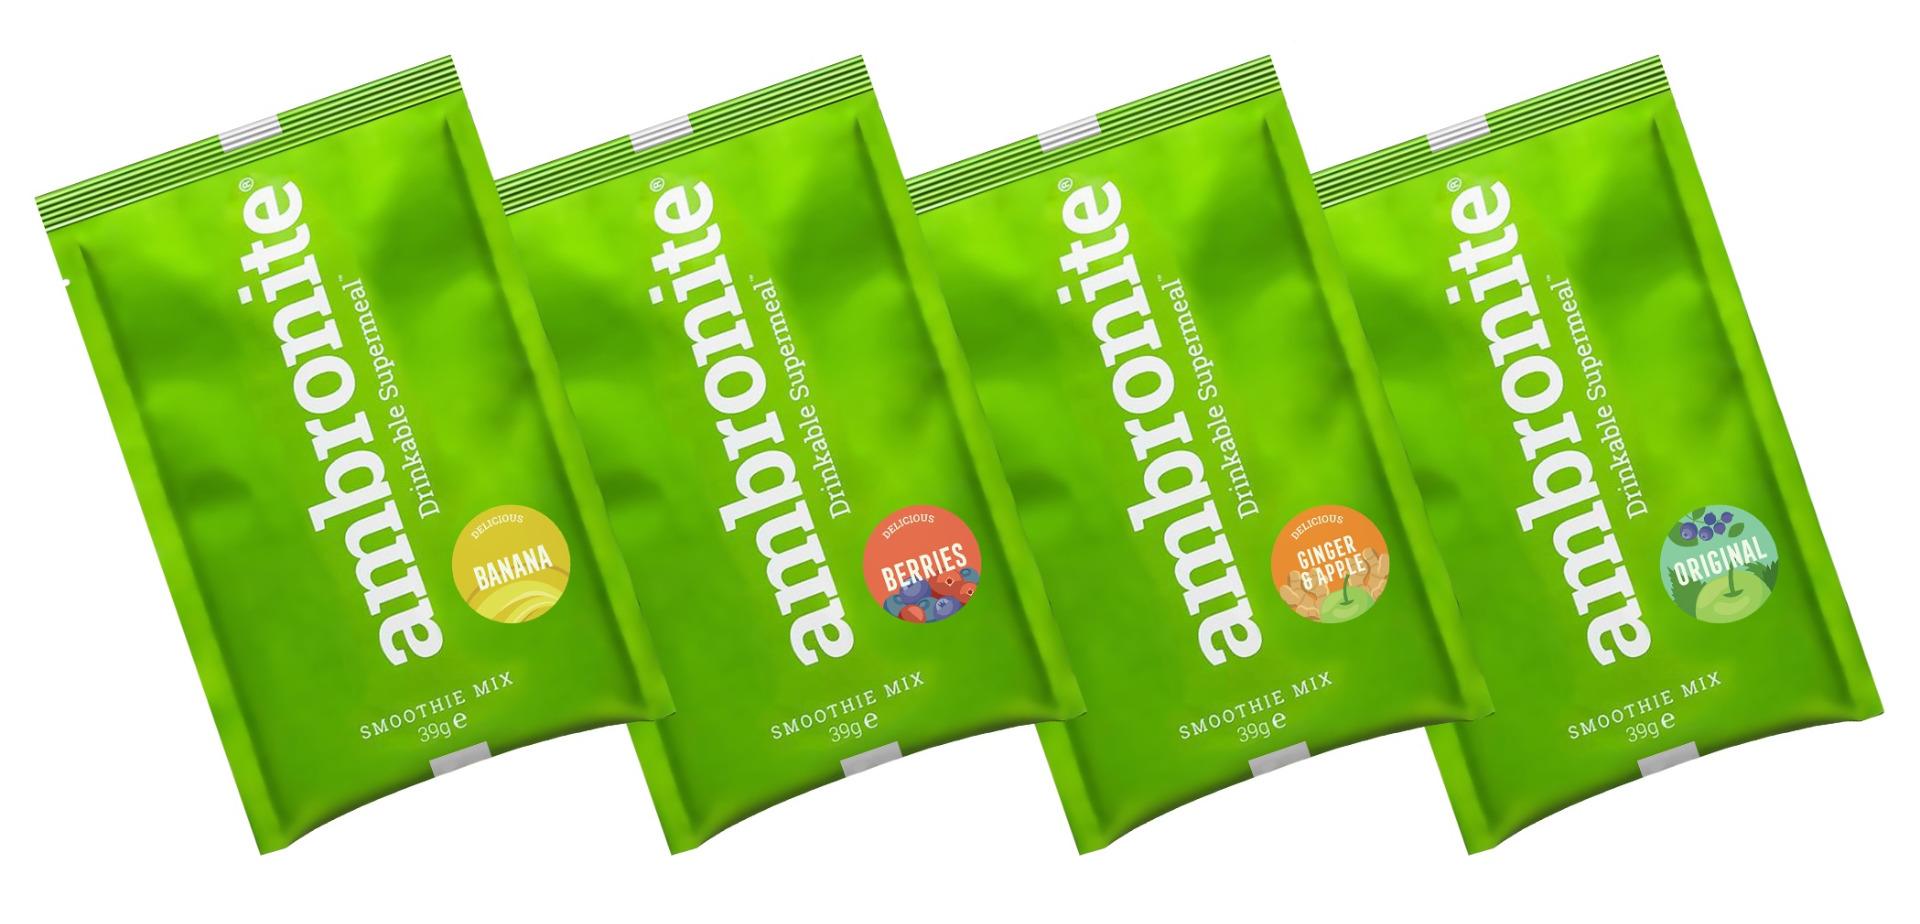 Ambronite 4x165 kcal Supermeals Sample